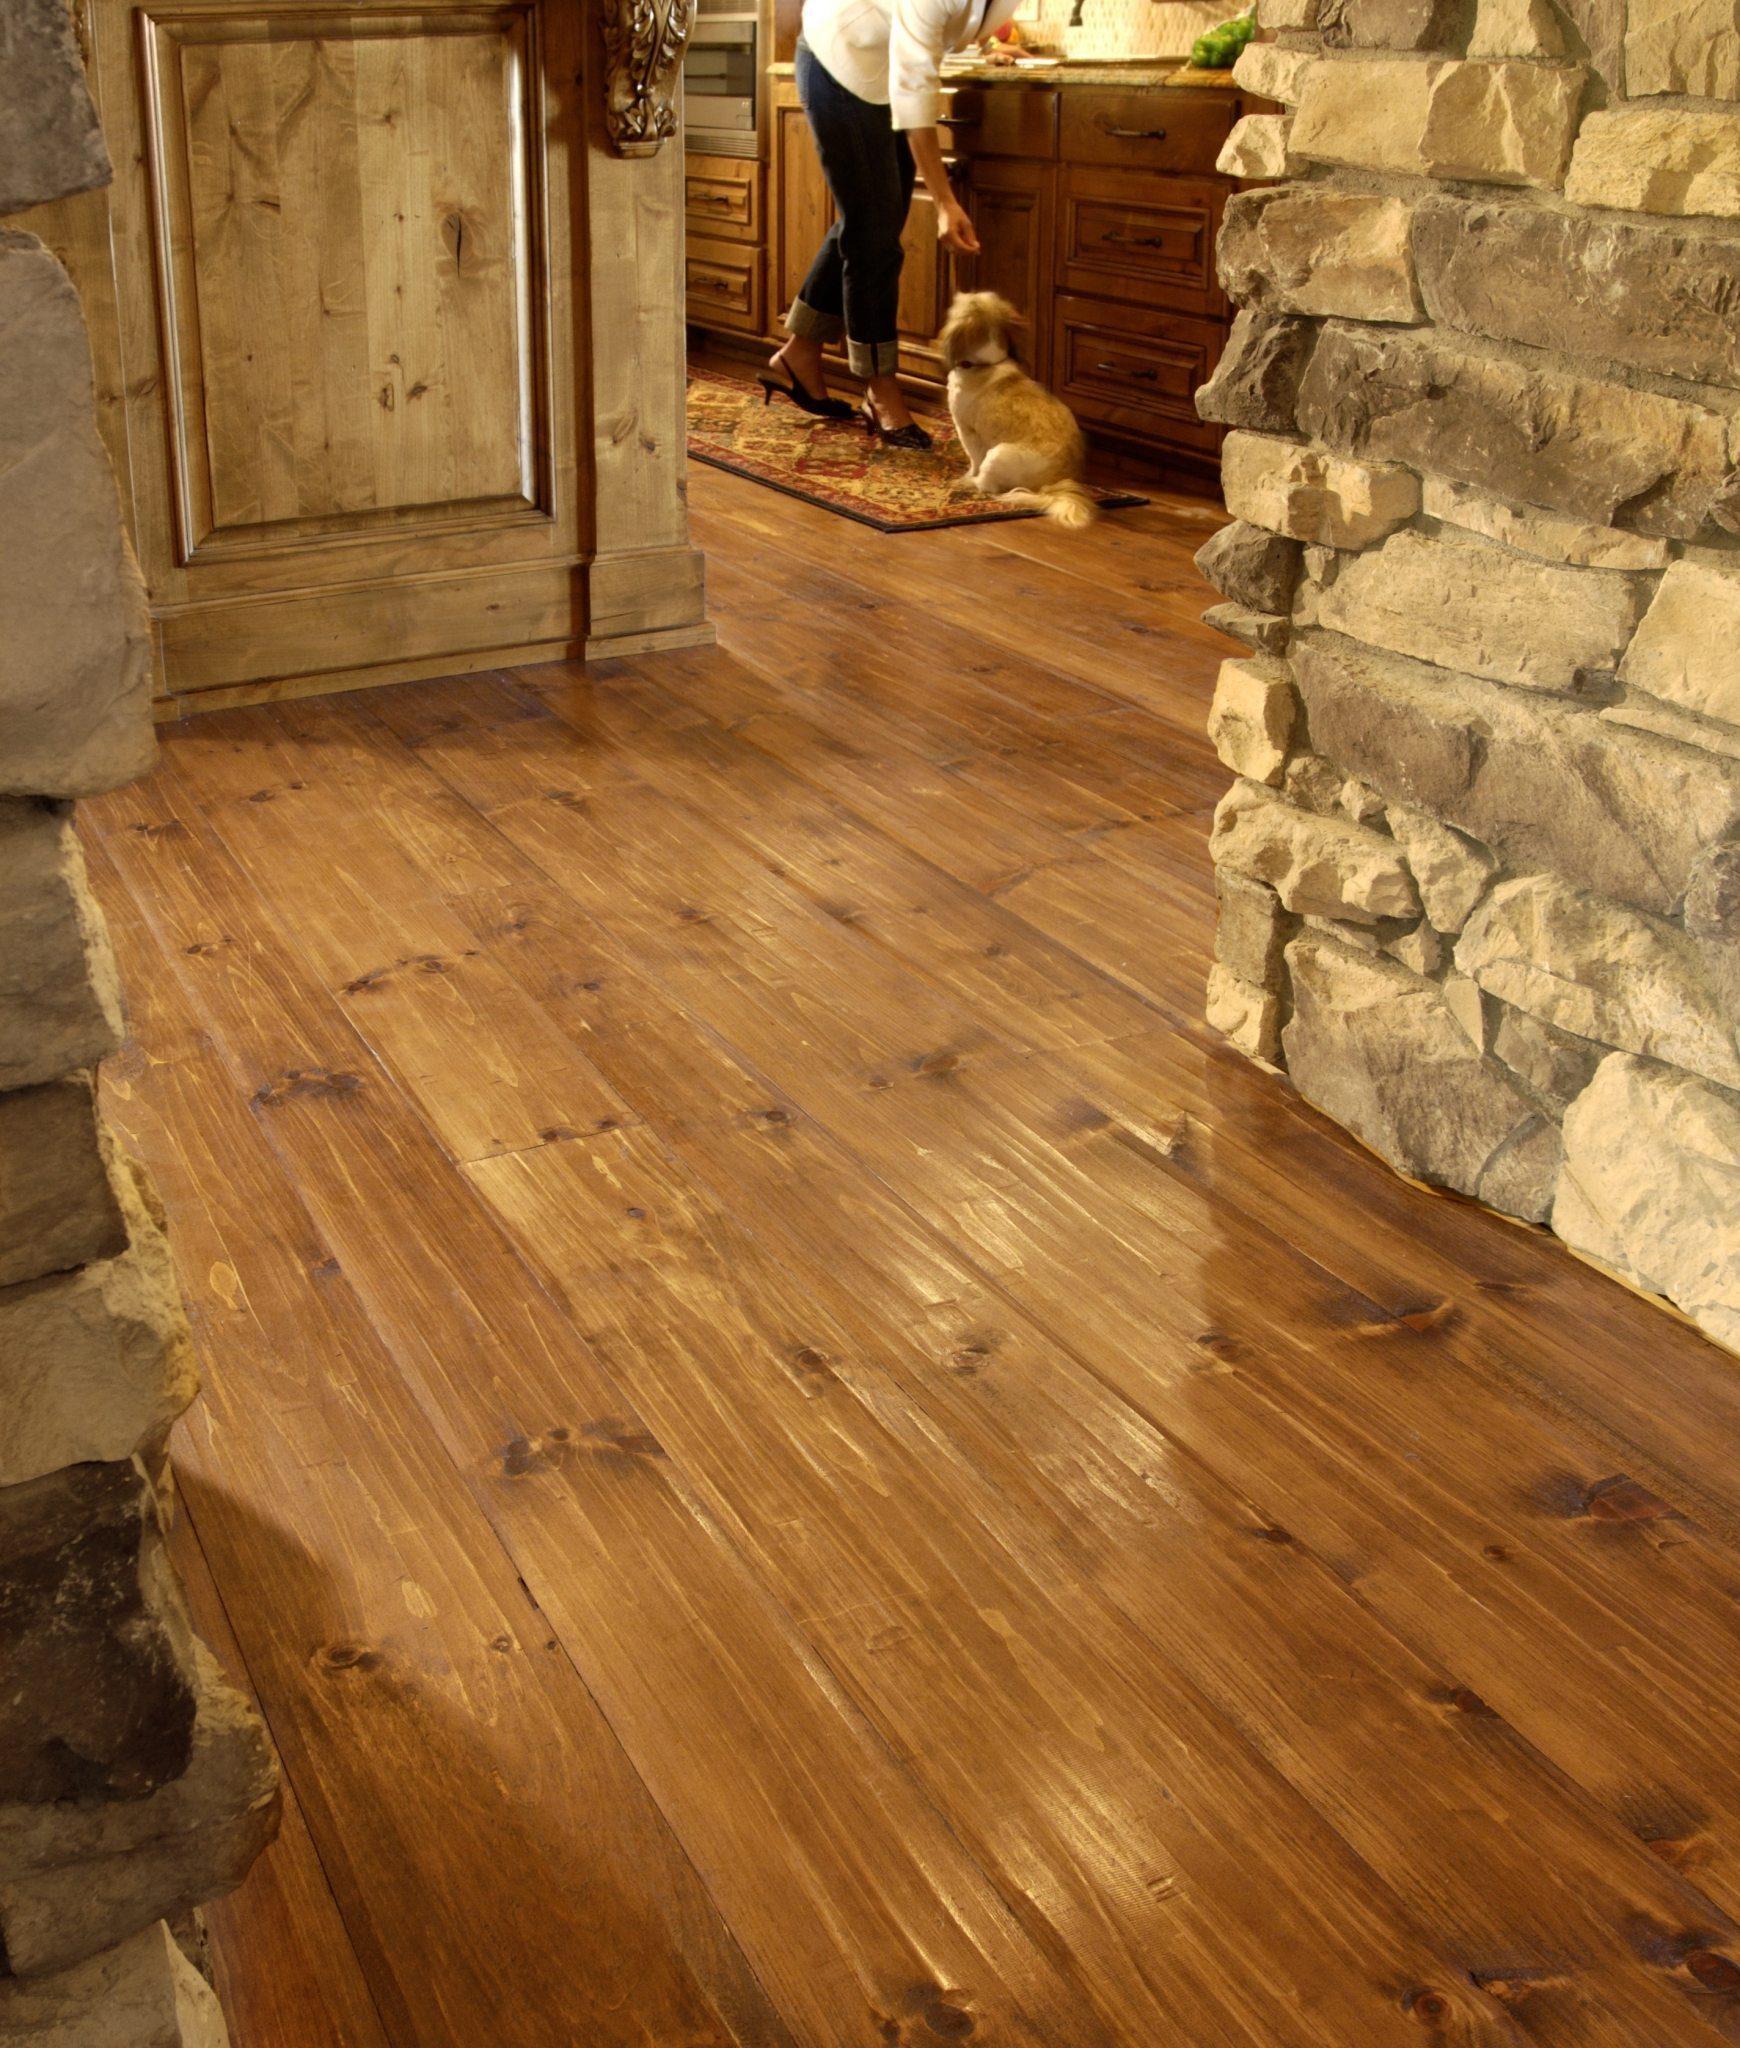 Eastern White Pine Flooring in a Hallway